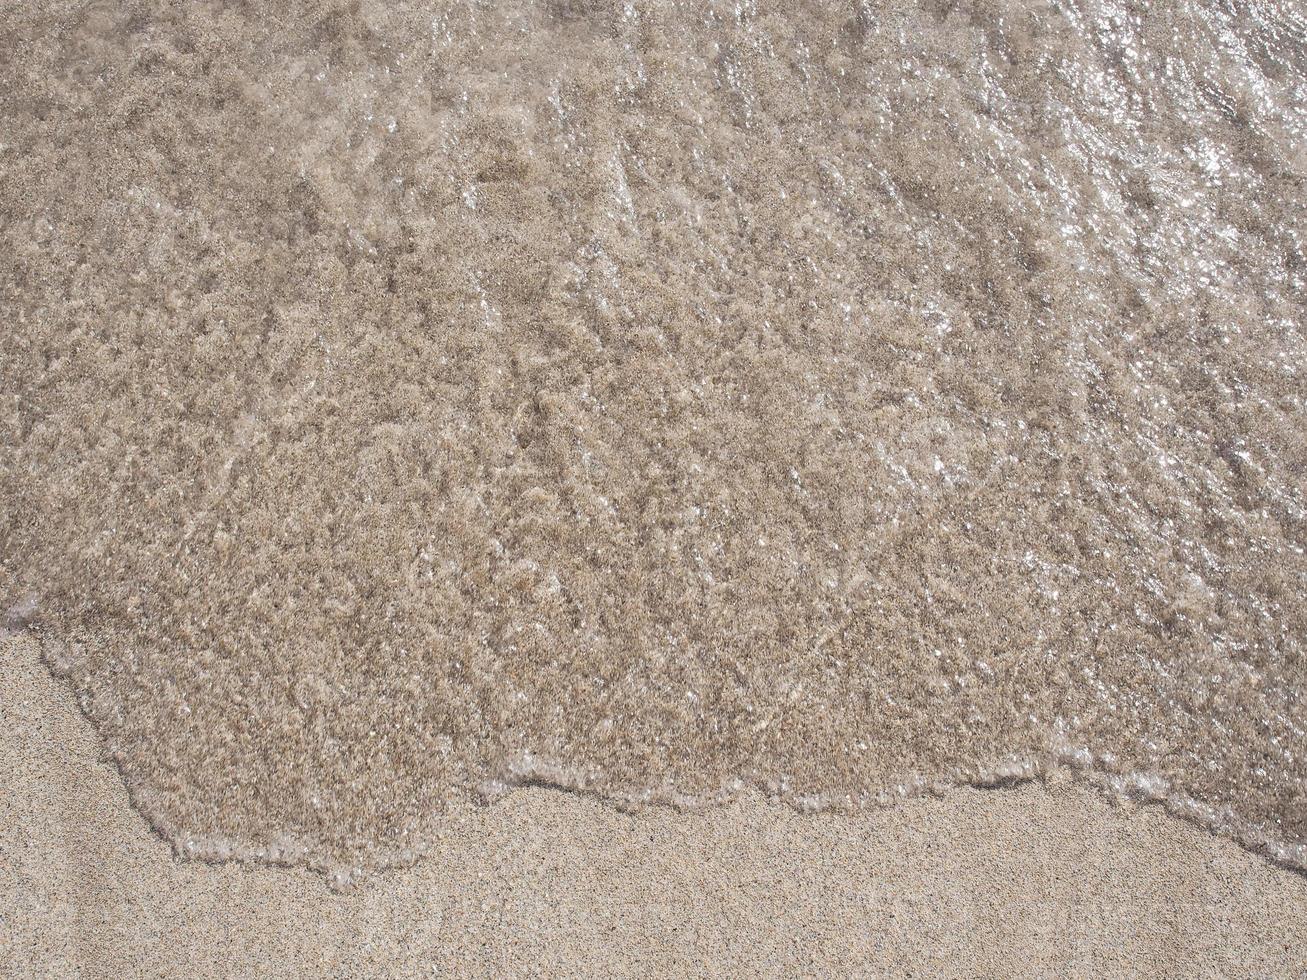 onda da praia de waikiki foto